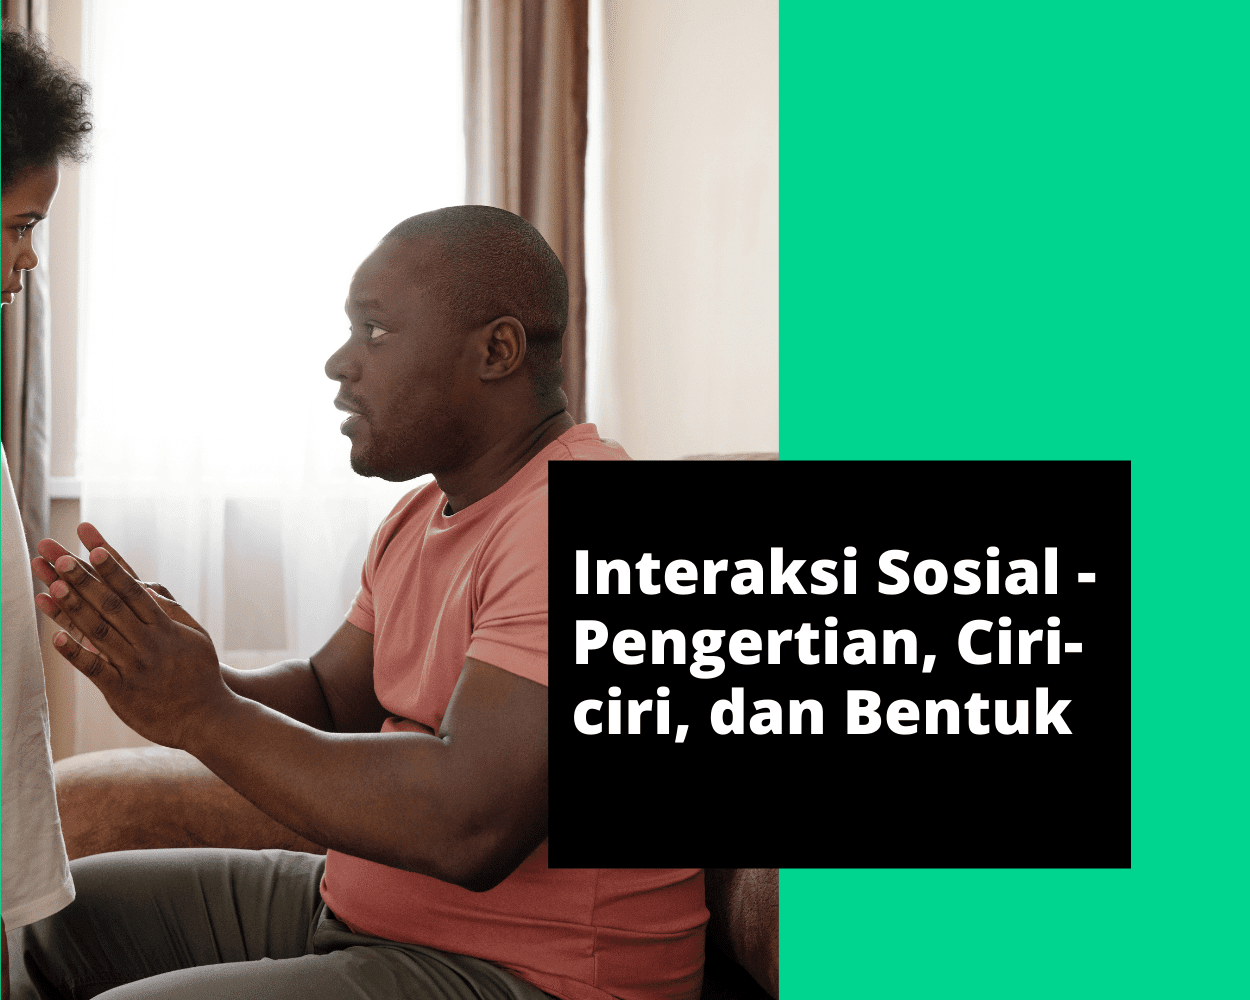 interaksi sosial - pengertian, ciri ciri dan bentuk